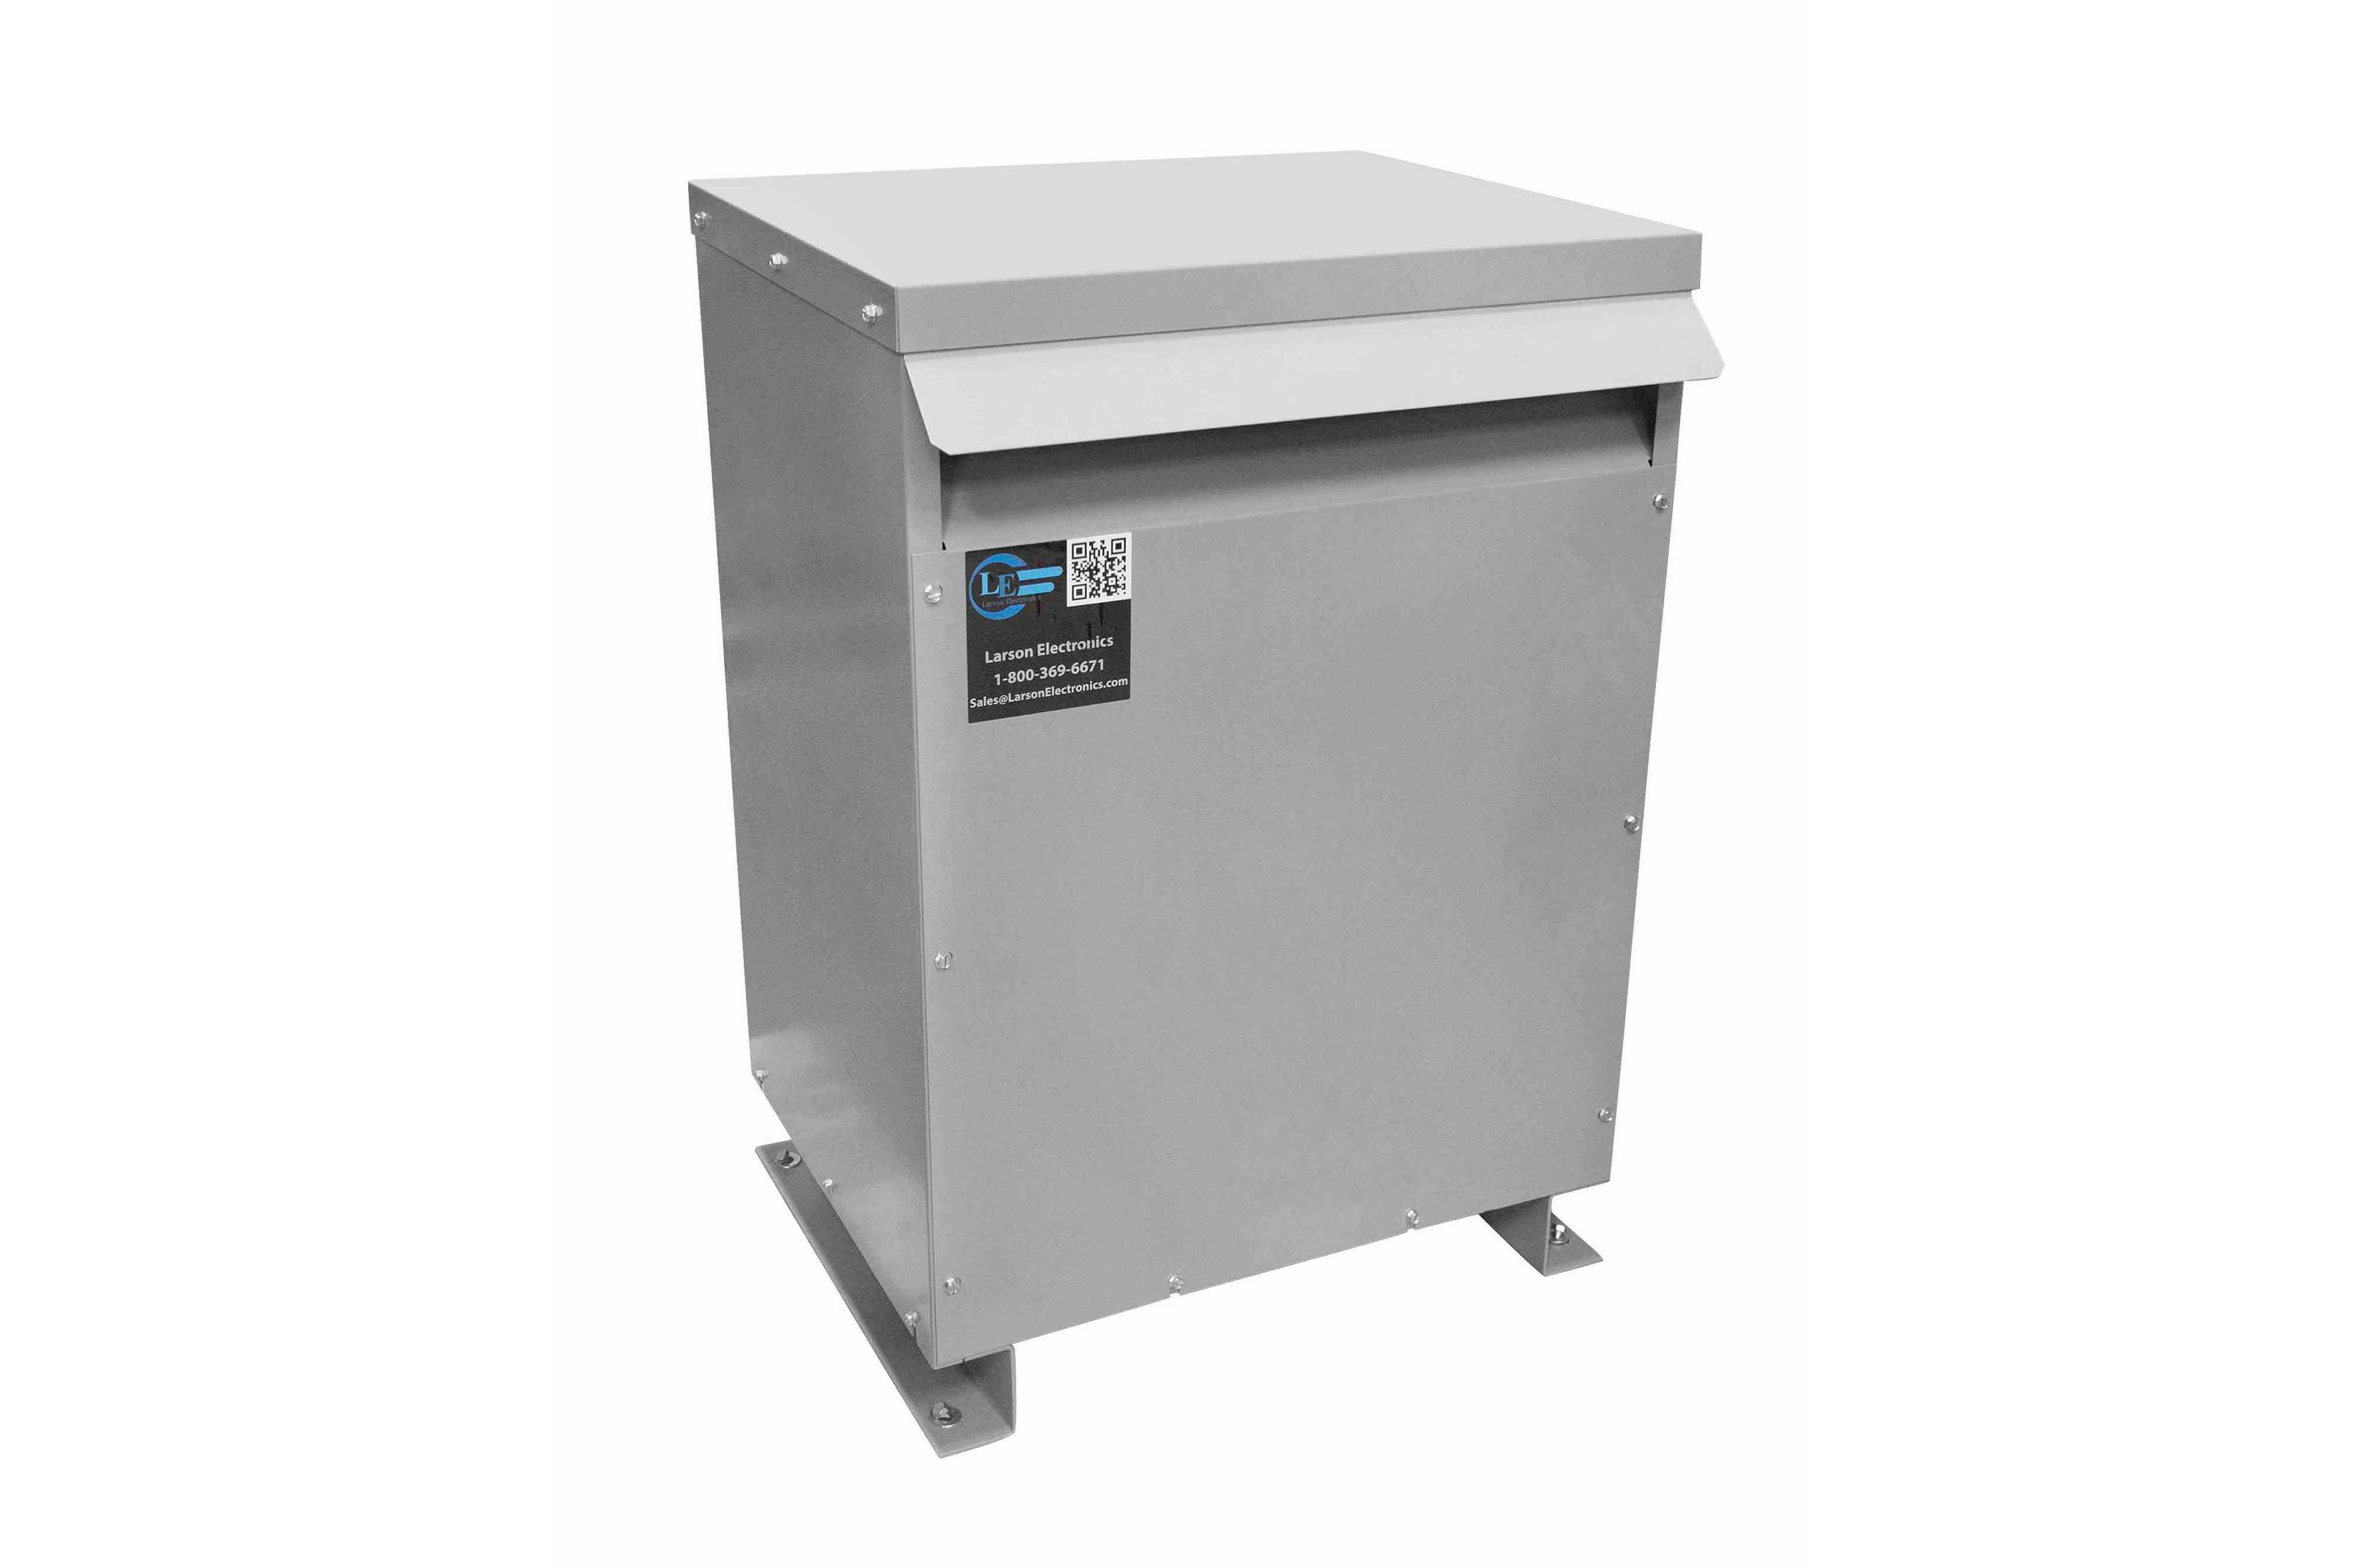 175 kVA 3PH Isolation Transformer, 460V Wye Primary, 240V Delta Secondary, N3R, Ventilated, 60 Hz